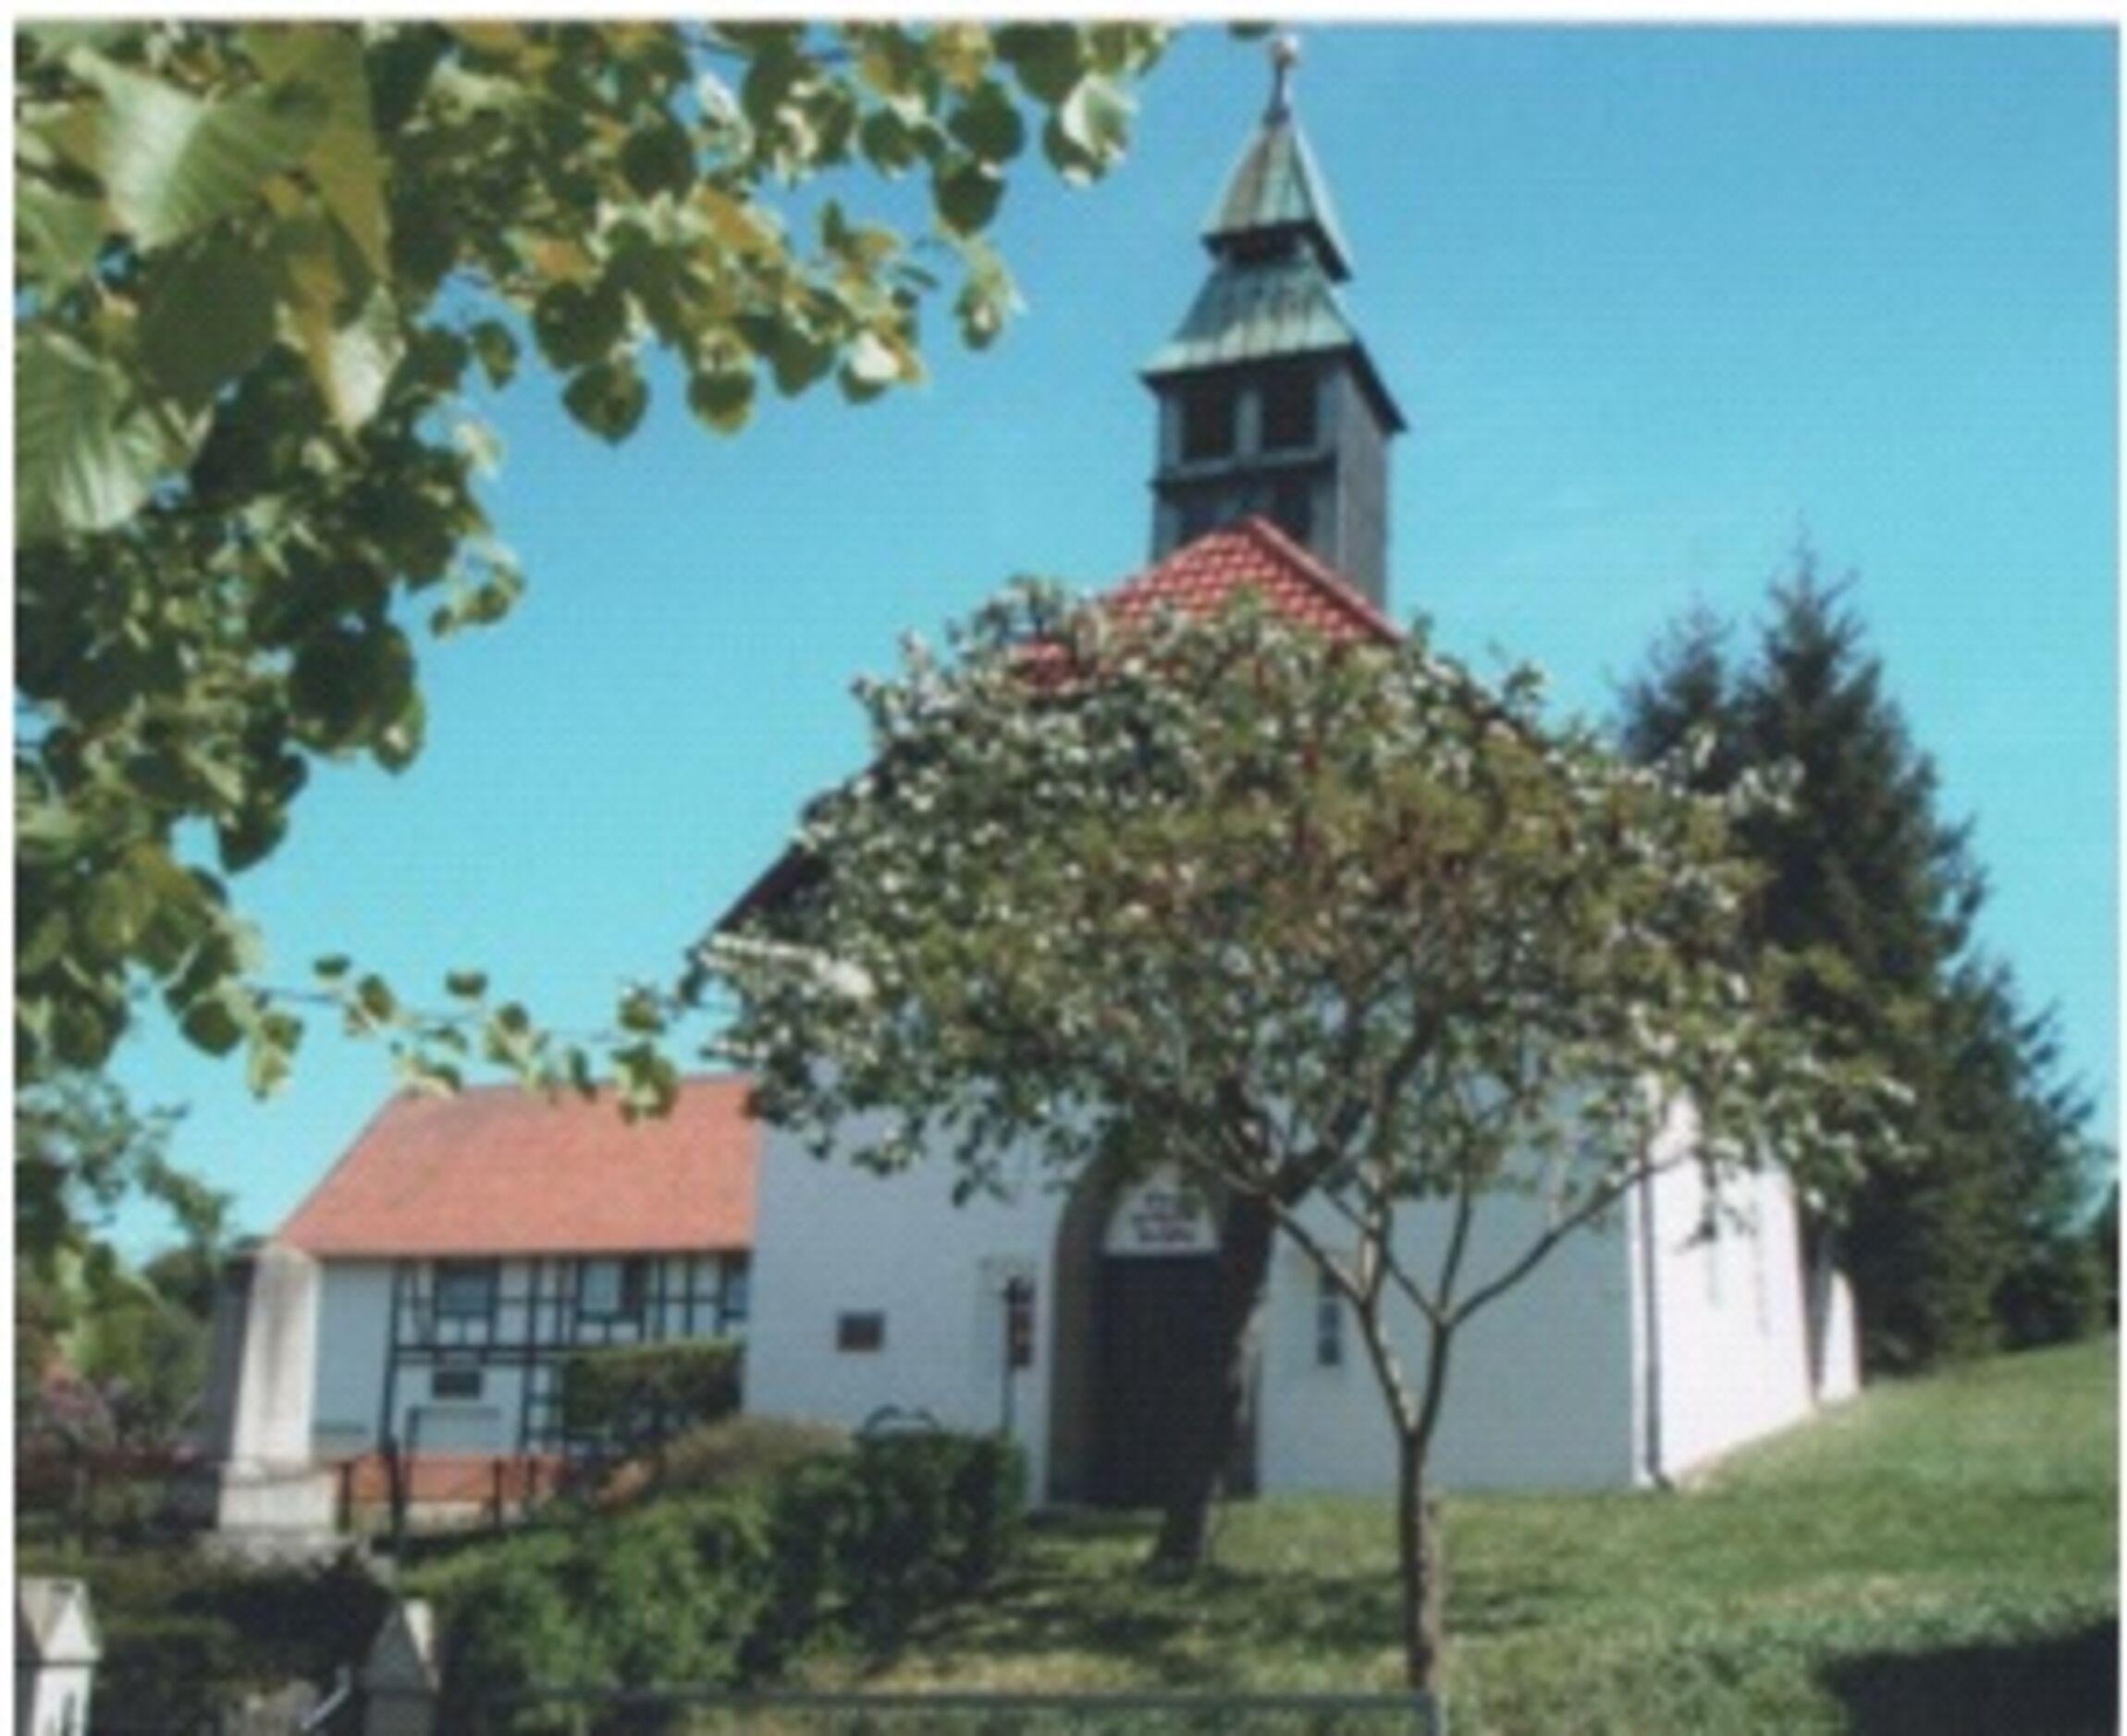 St. Pankratius-Kirche Denkershausen